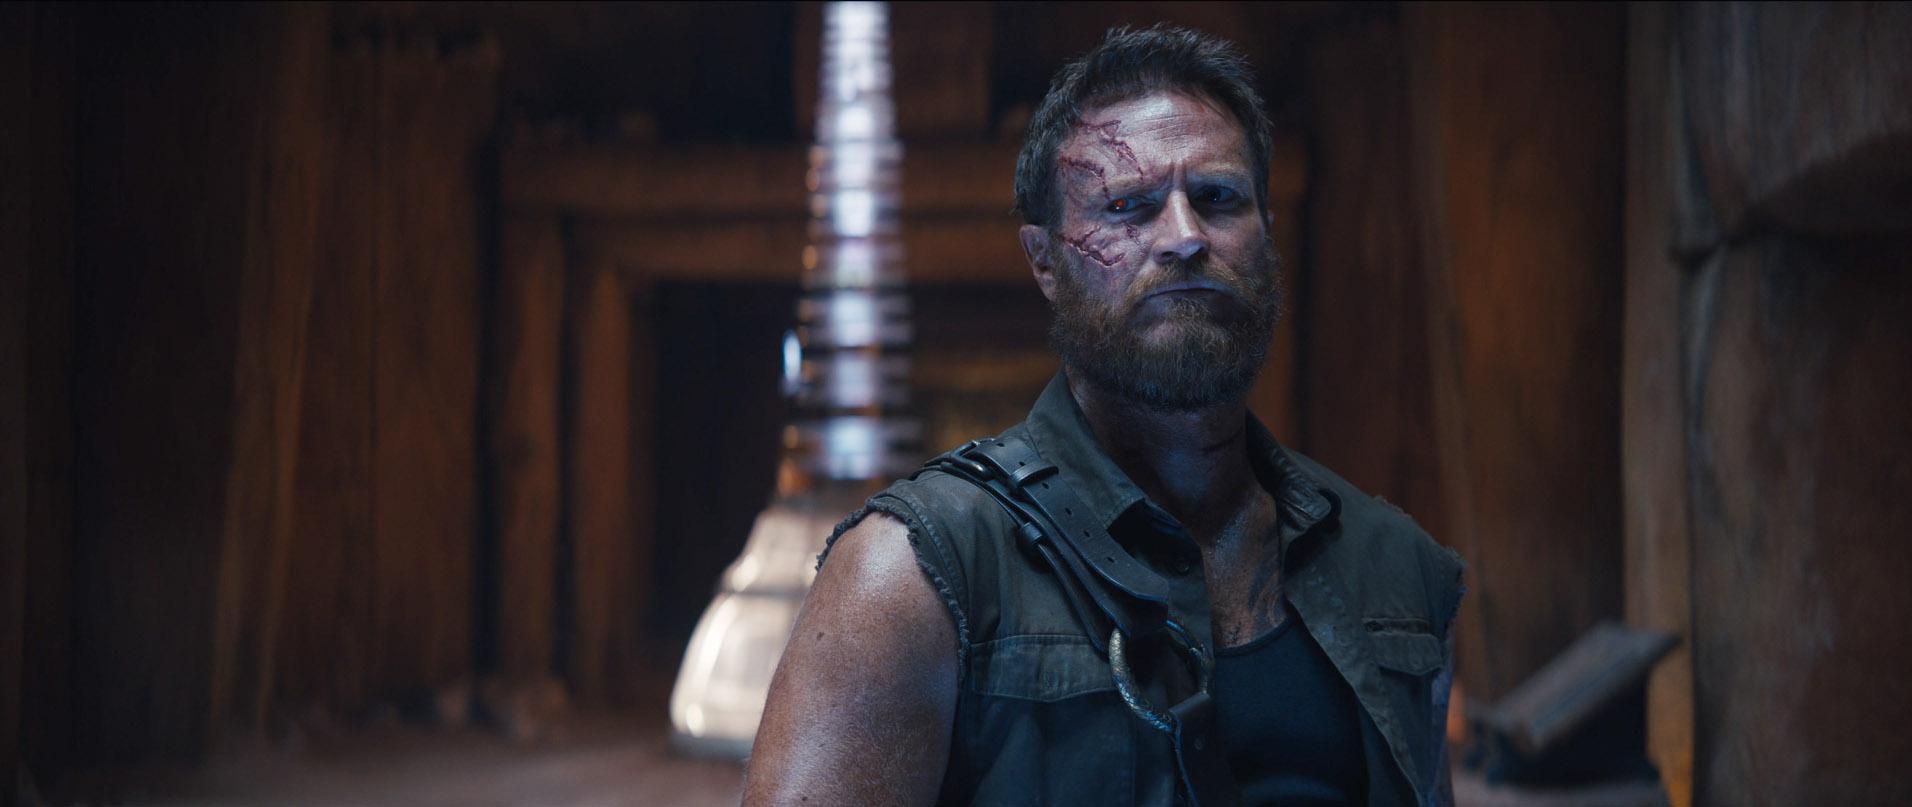 Mortal Kombat (2021) - Photo Gallery - IMDb